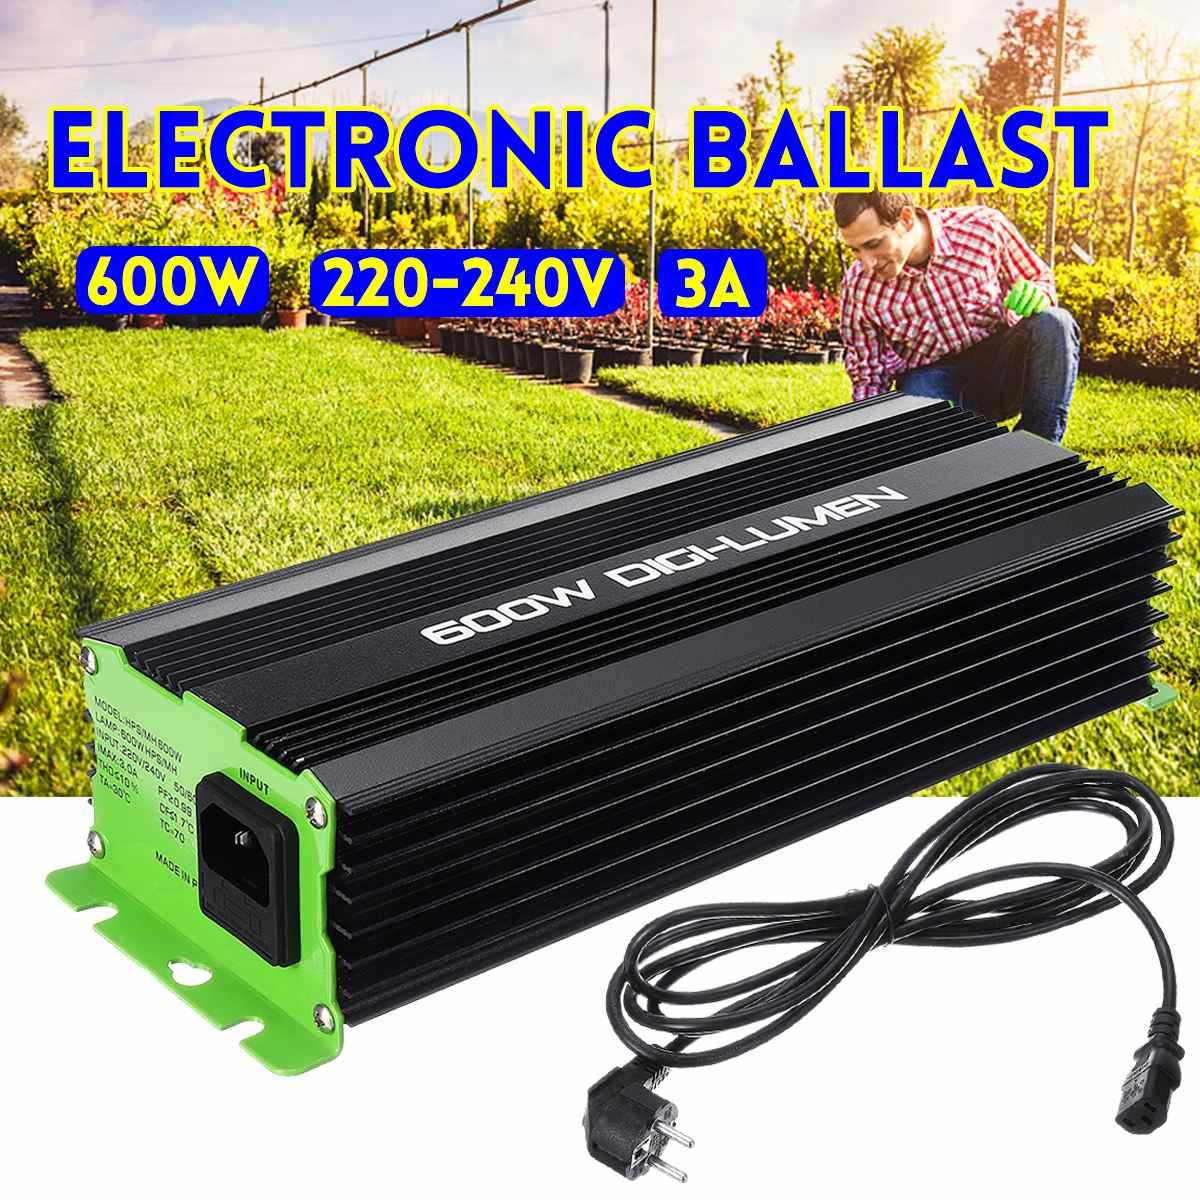 Digital 600W Ballasts for Garden Planter Grow Lights HPS MH Bulbs Electronic Dimmable EU PLUG 3A 220-240V